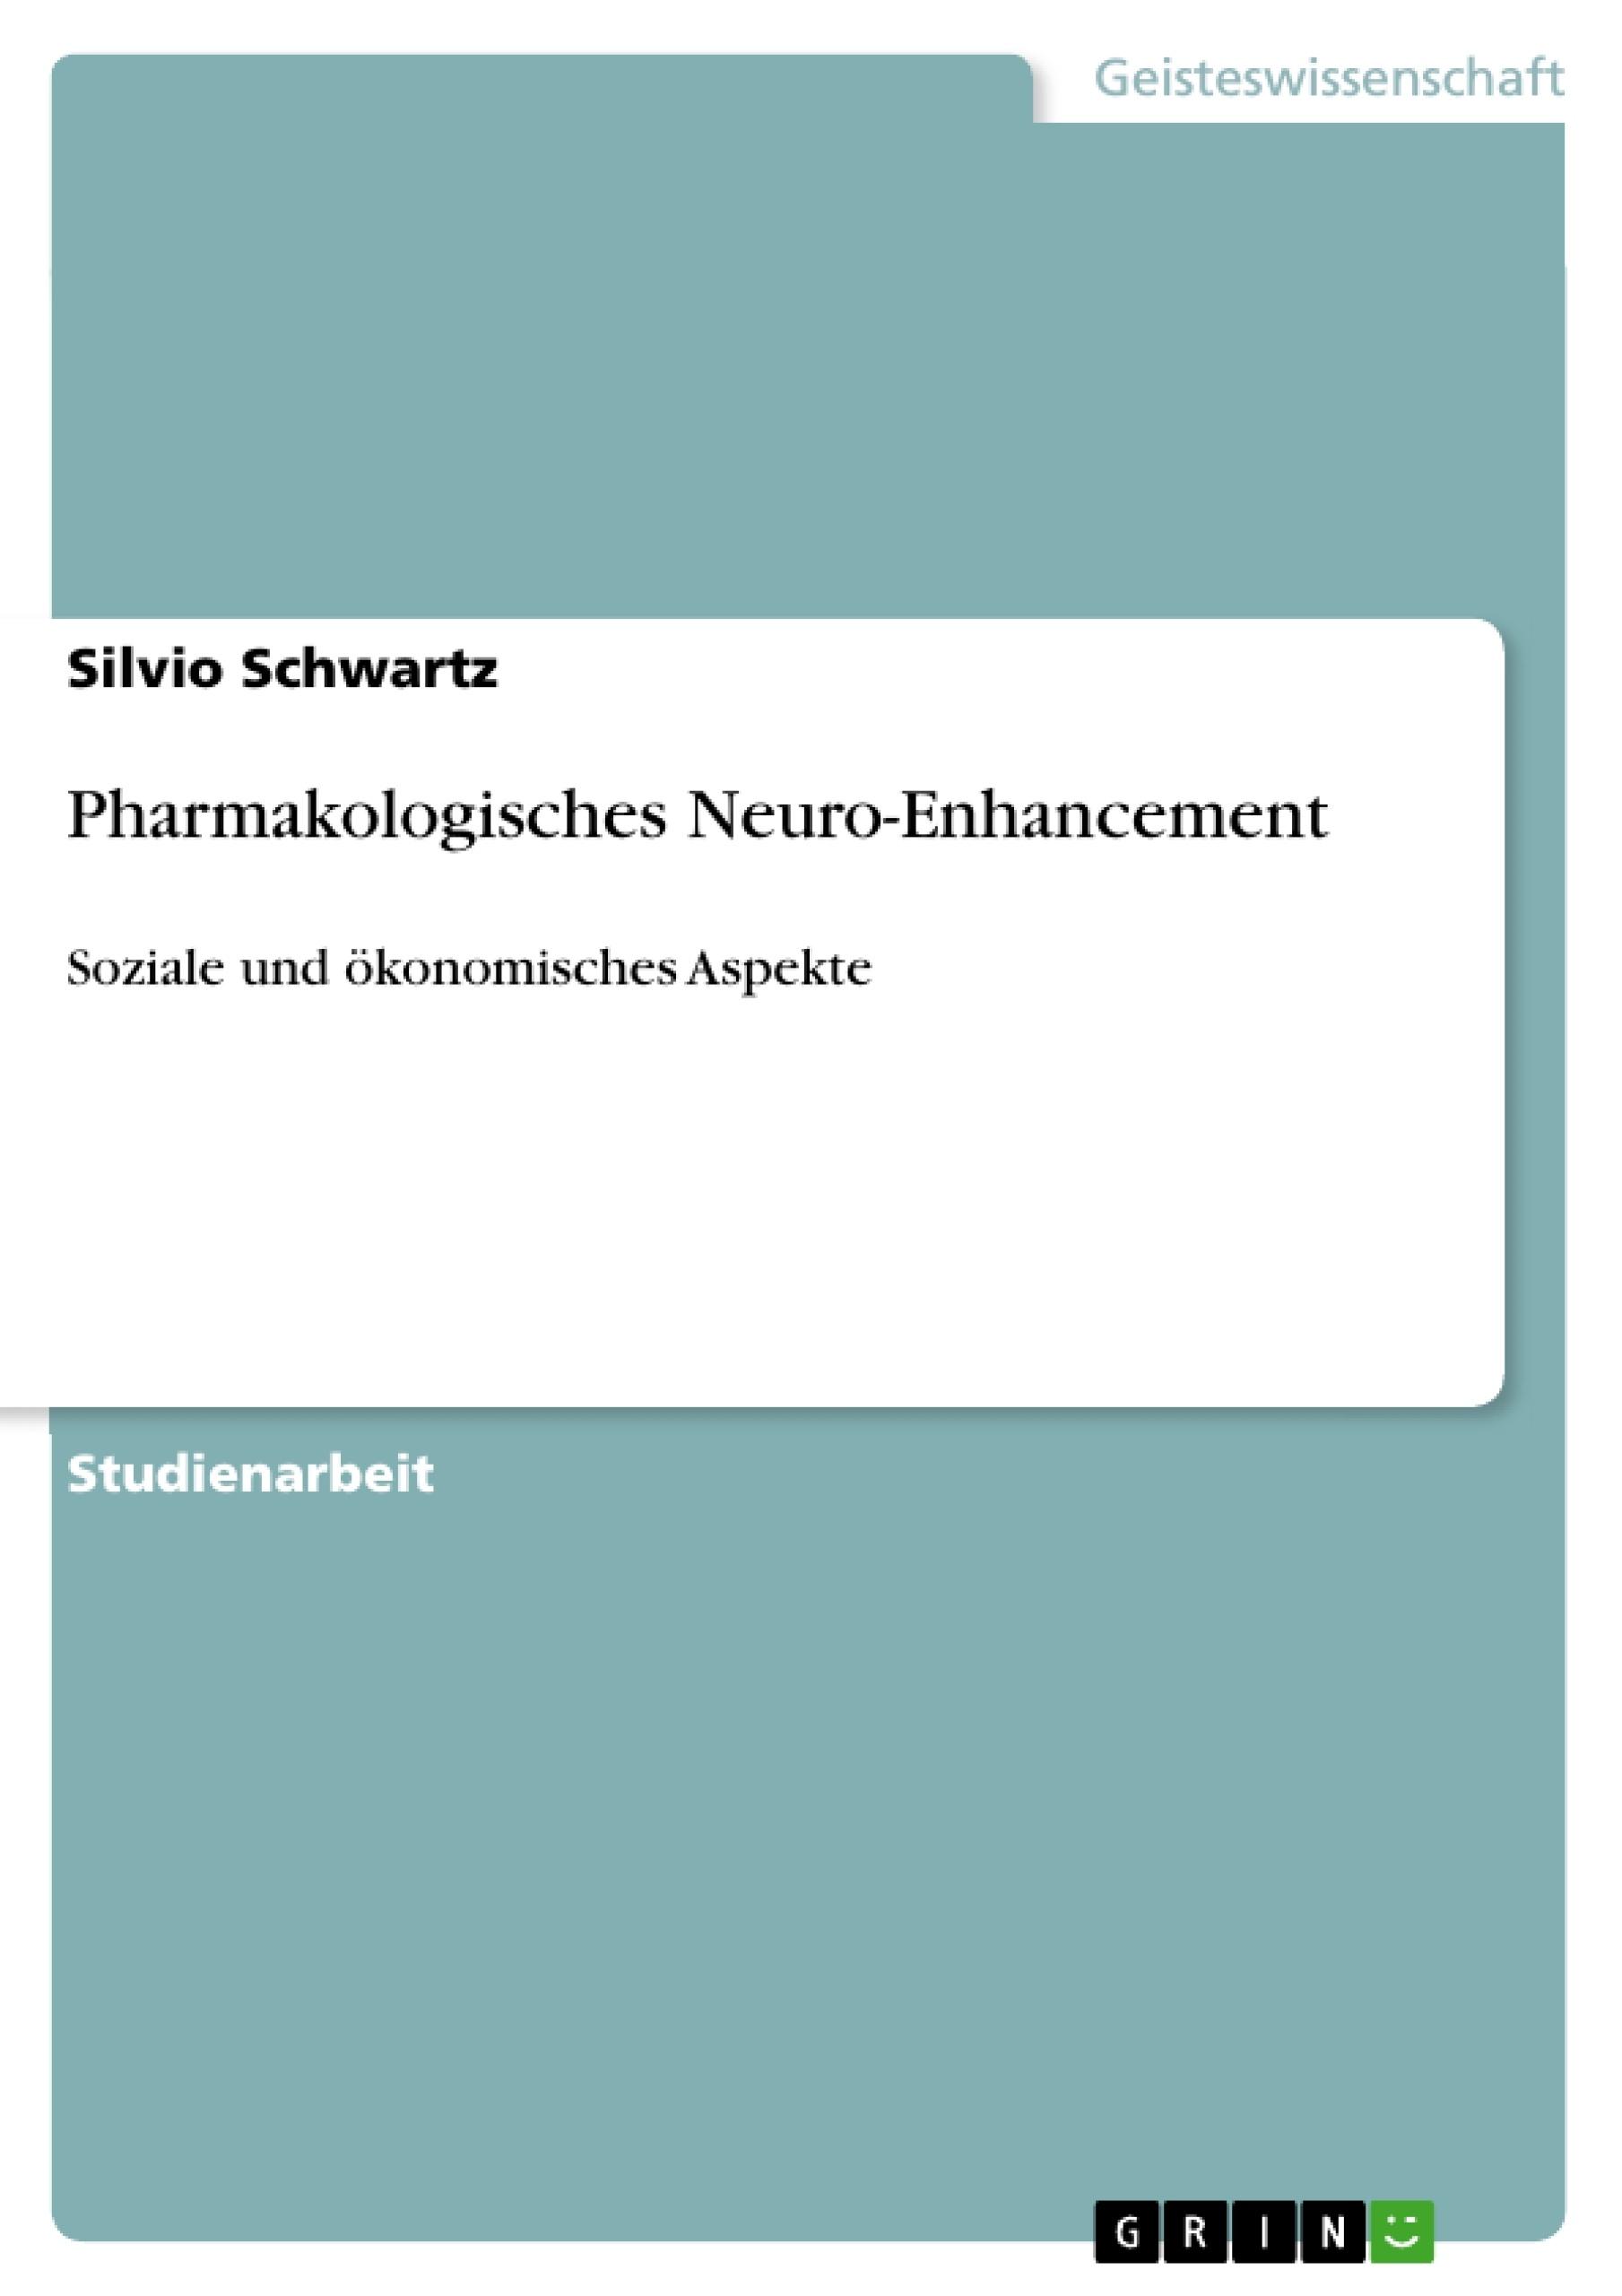 Titel: Pharmakologisches Neuro-Enhancement